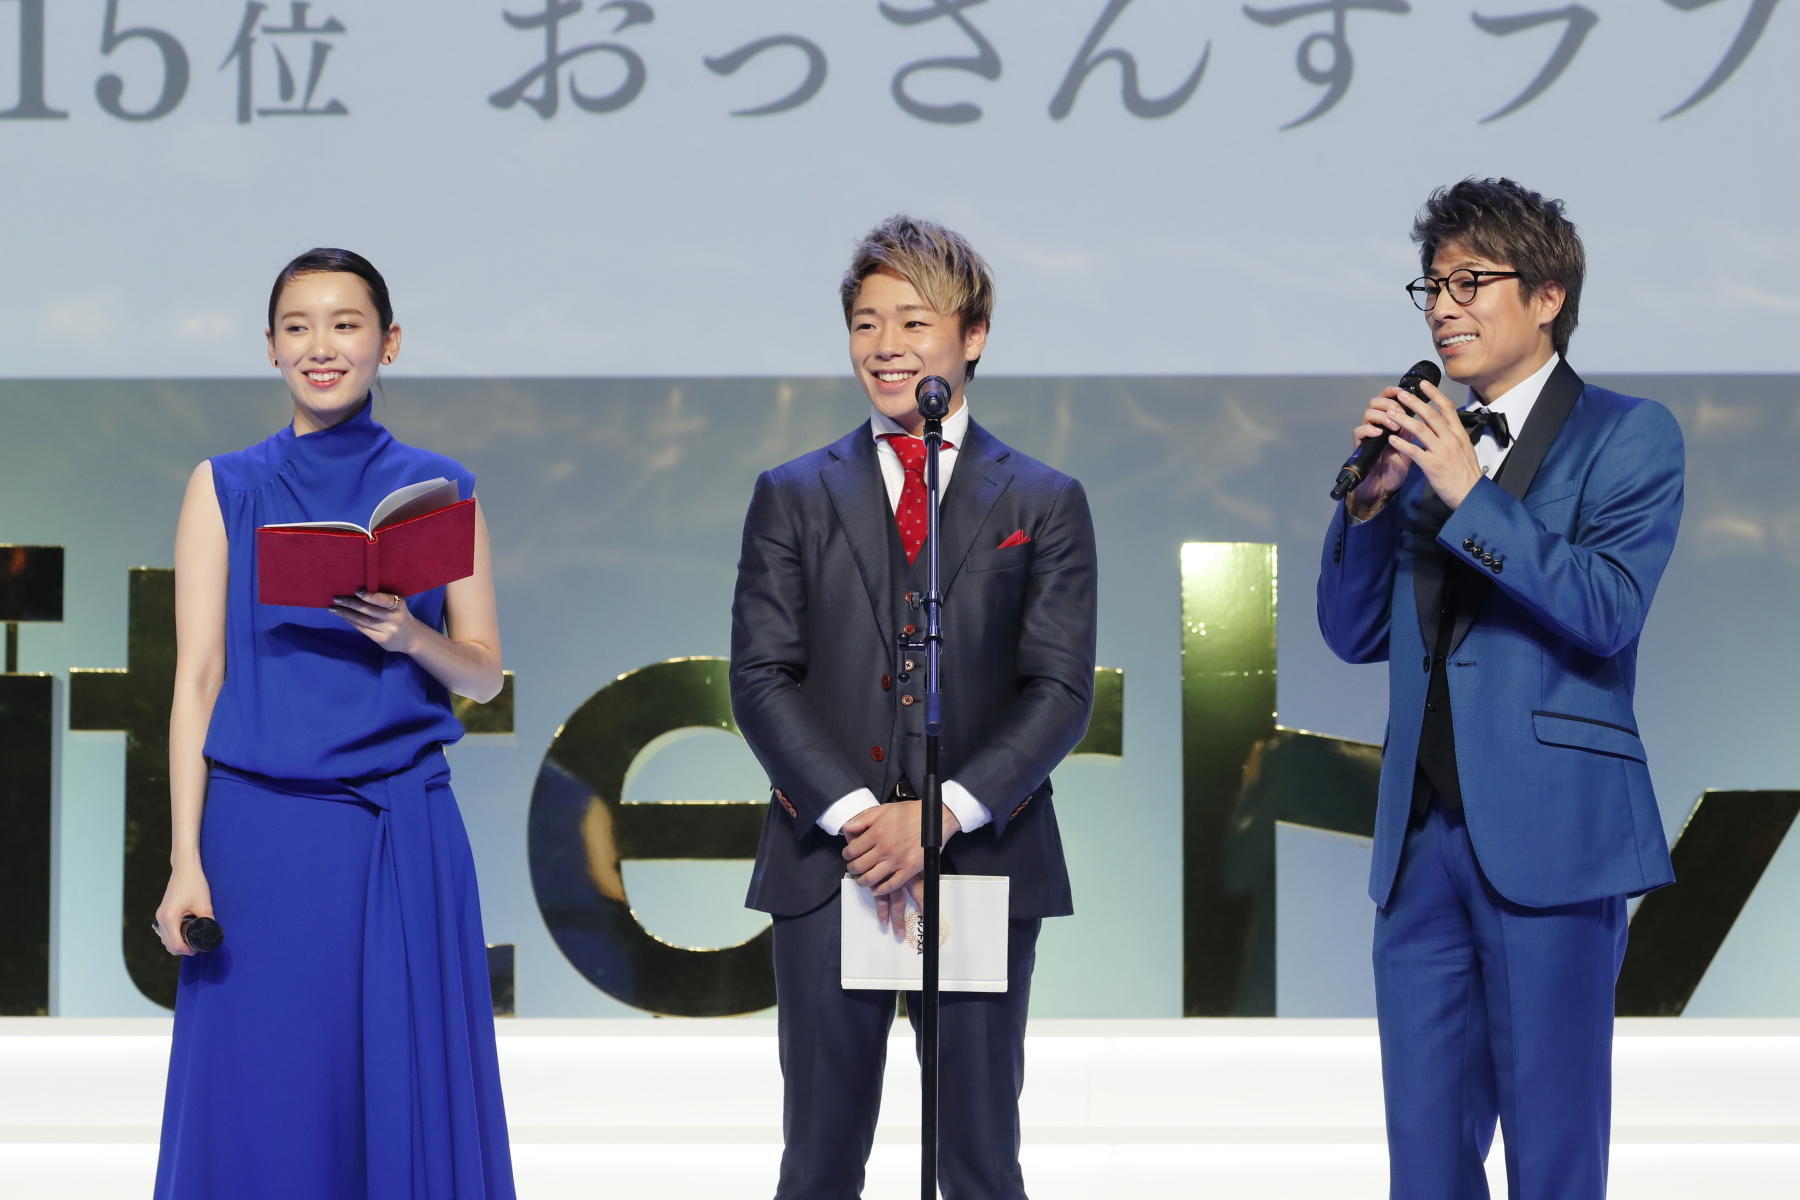 http://news.yoshimoto.co.jp/20190122013359-c8384826077633b19dd872f0f96692688a3c9d92.jpg